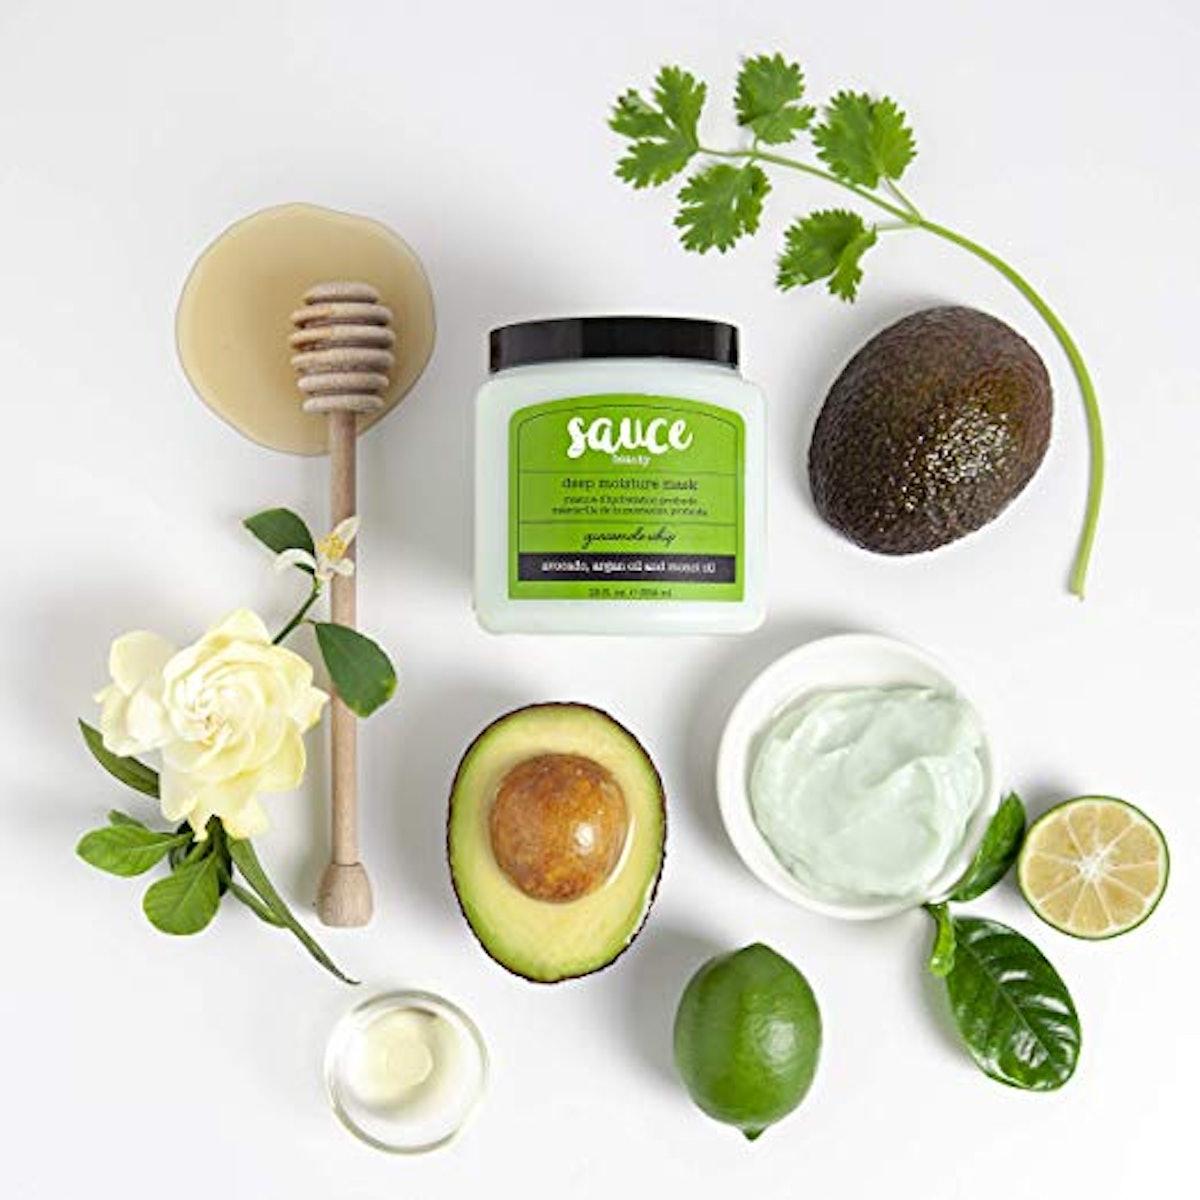 Sauce Beauty Guacamole Whip Hair Mask